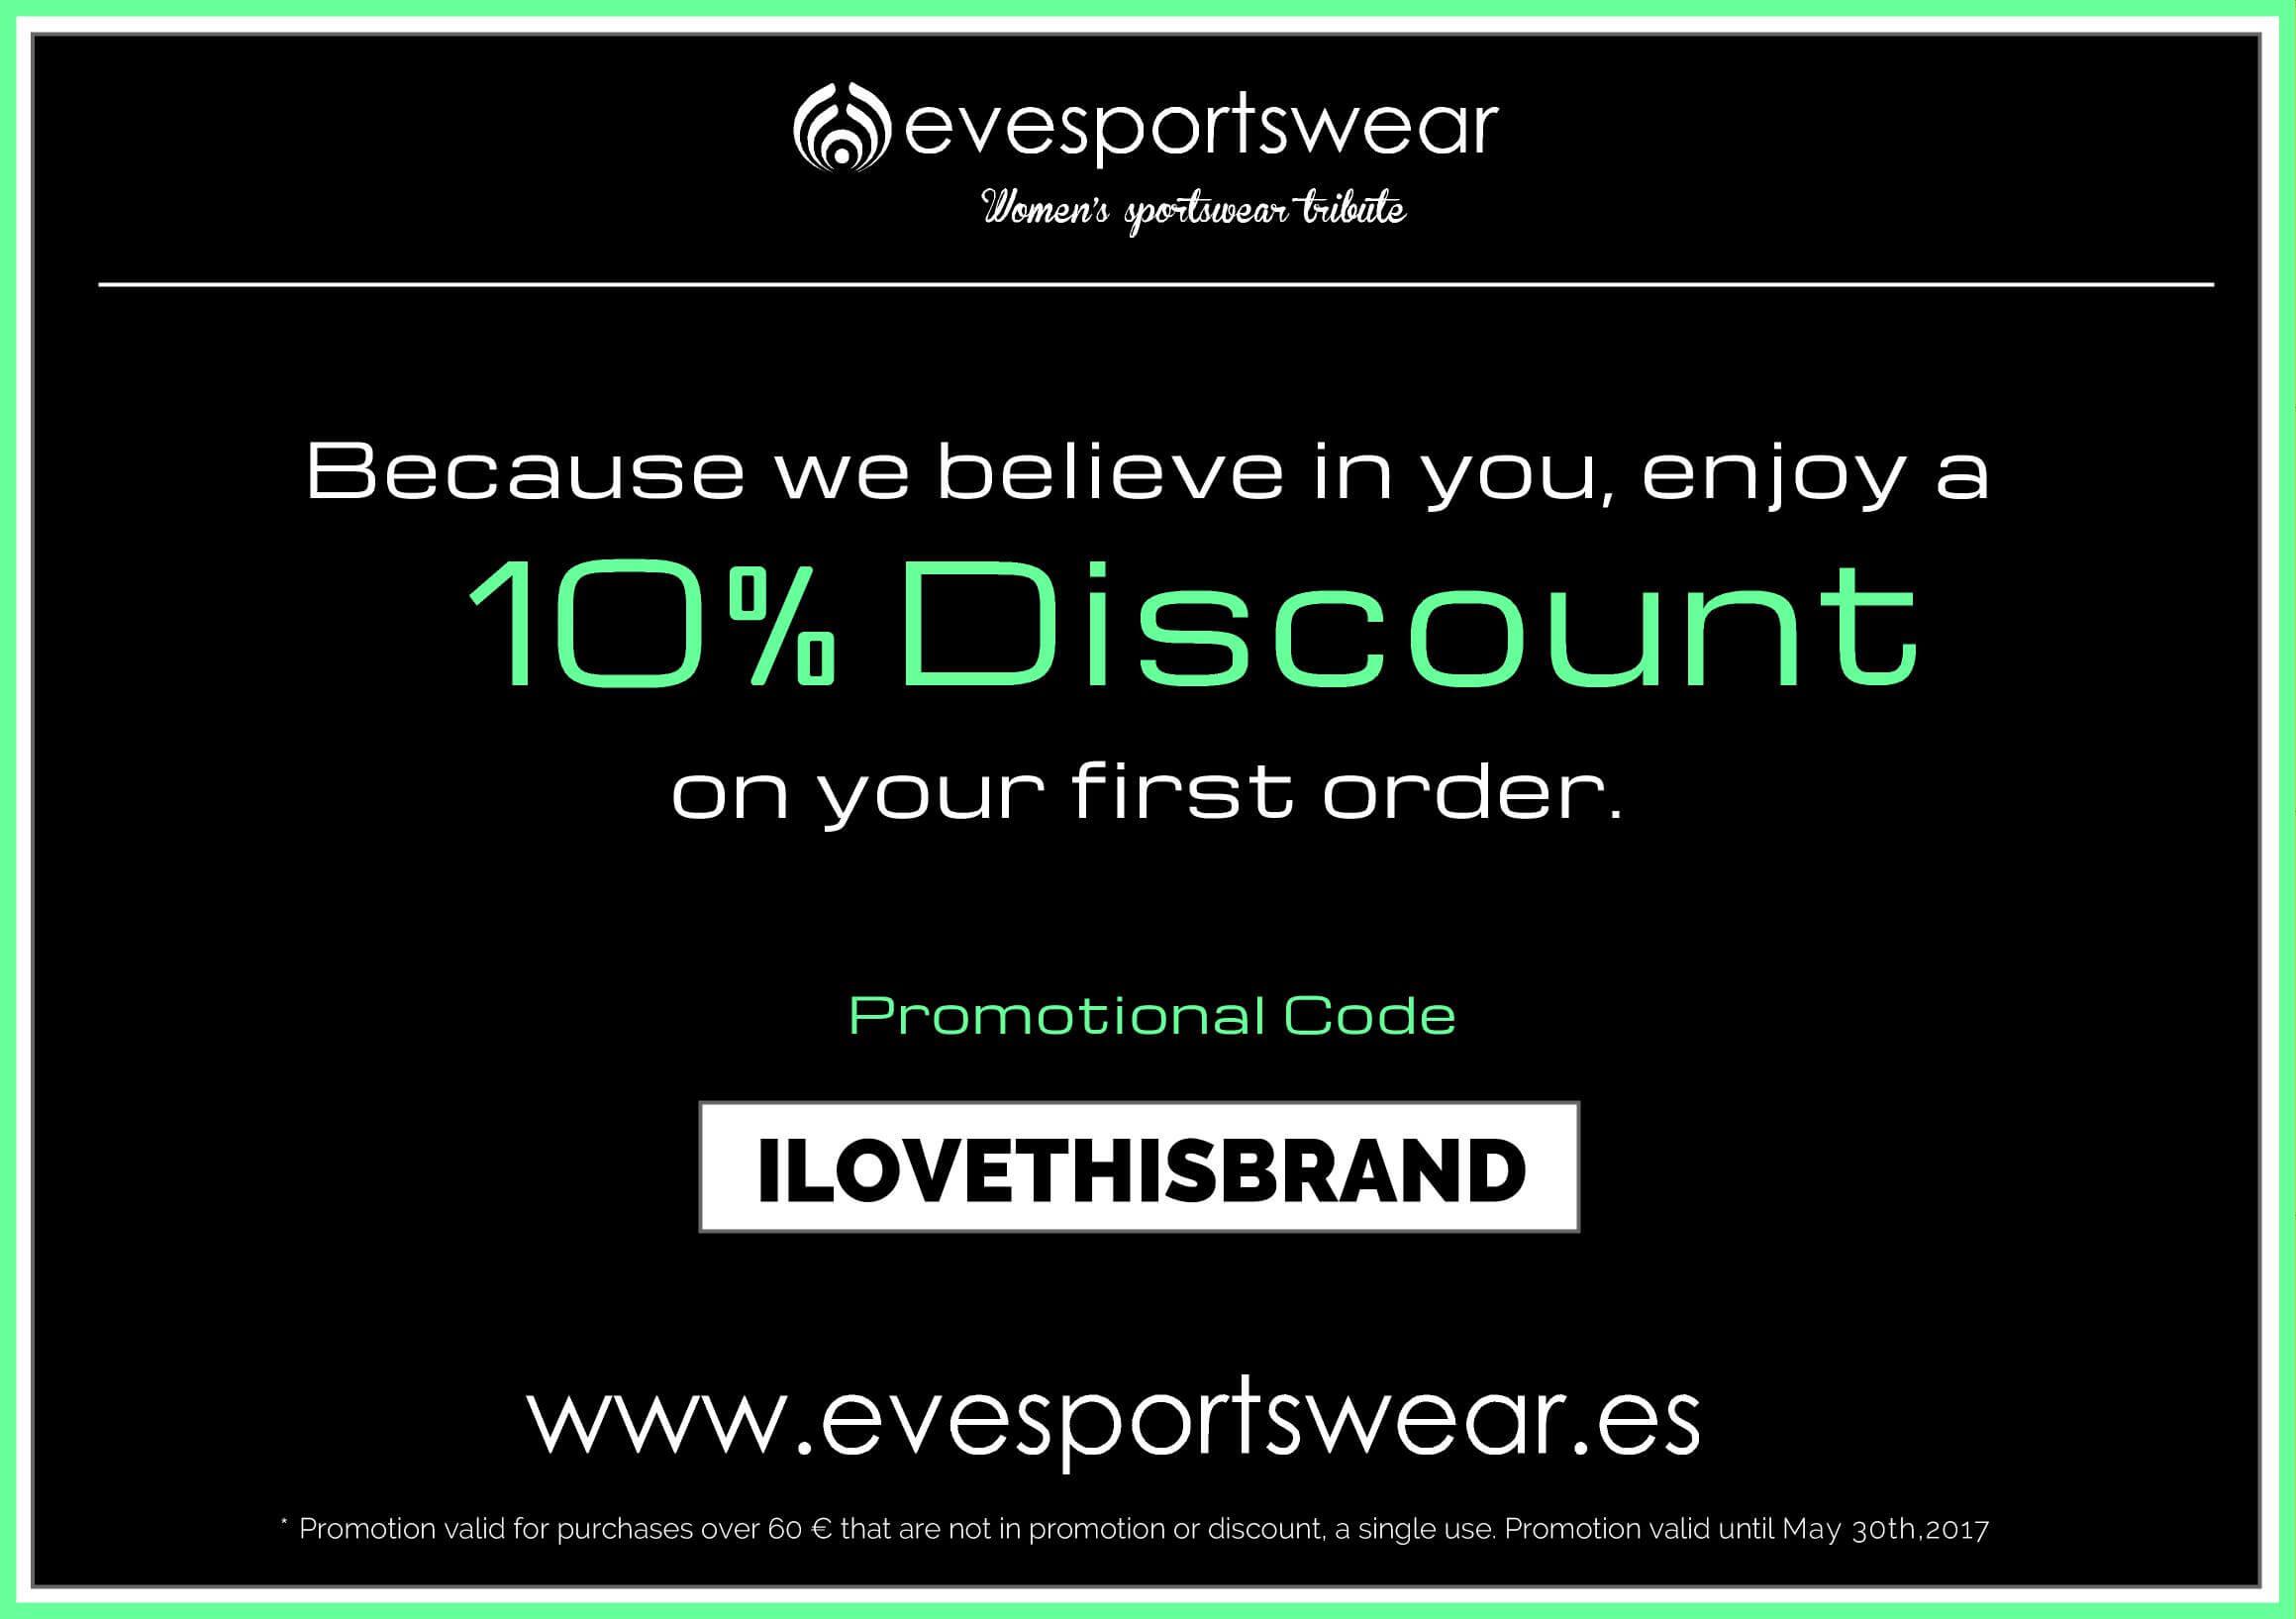 Evesportwear Promo